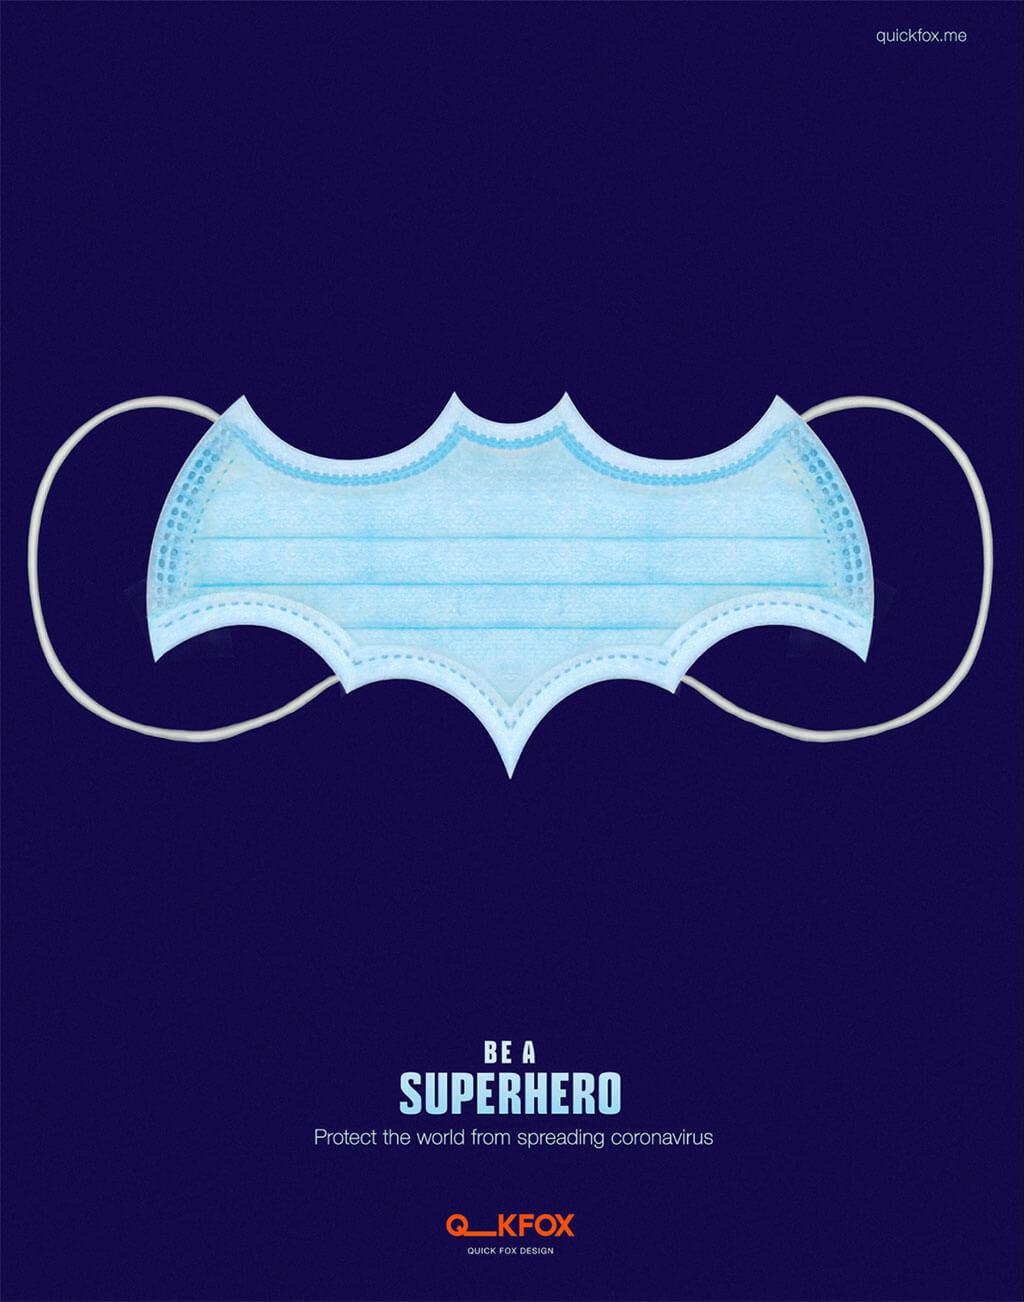 Batman Fan Art by Quick Fox Design, Pramod Kumar